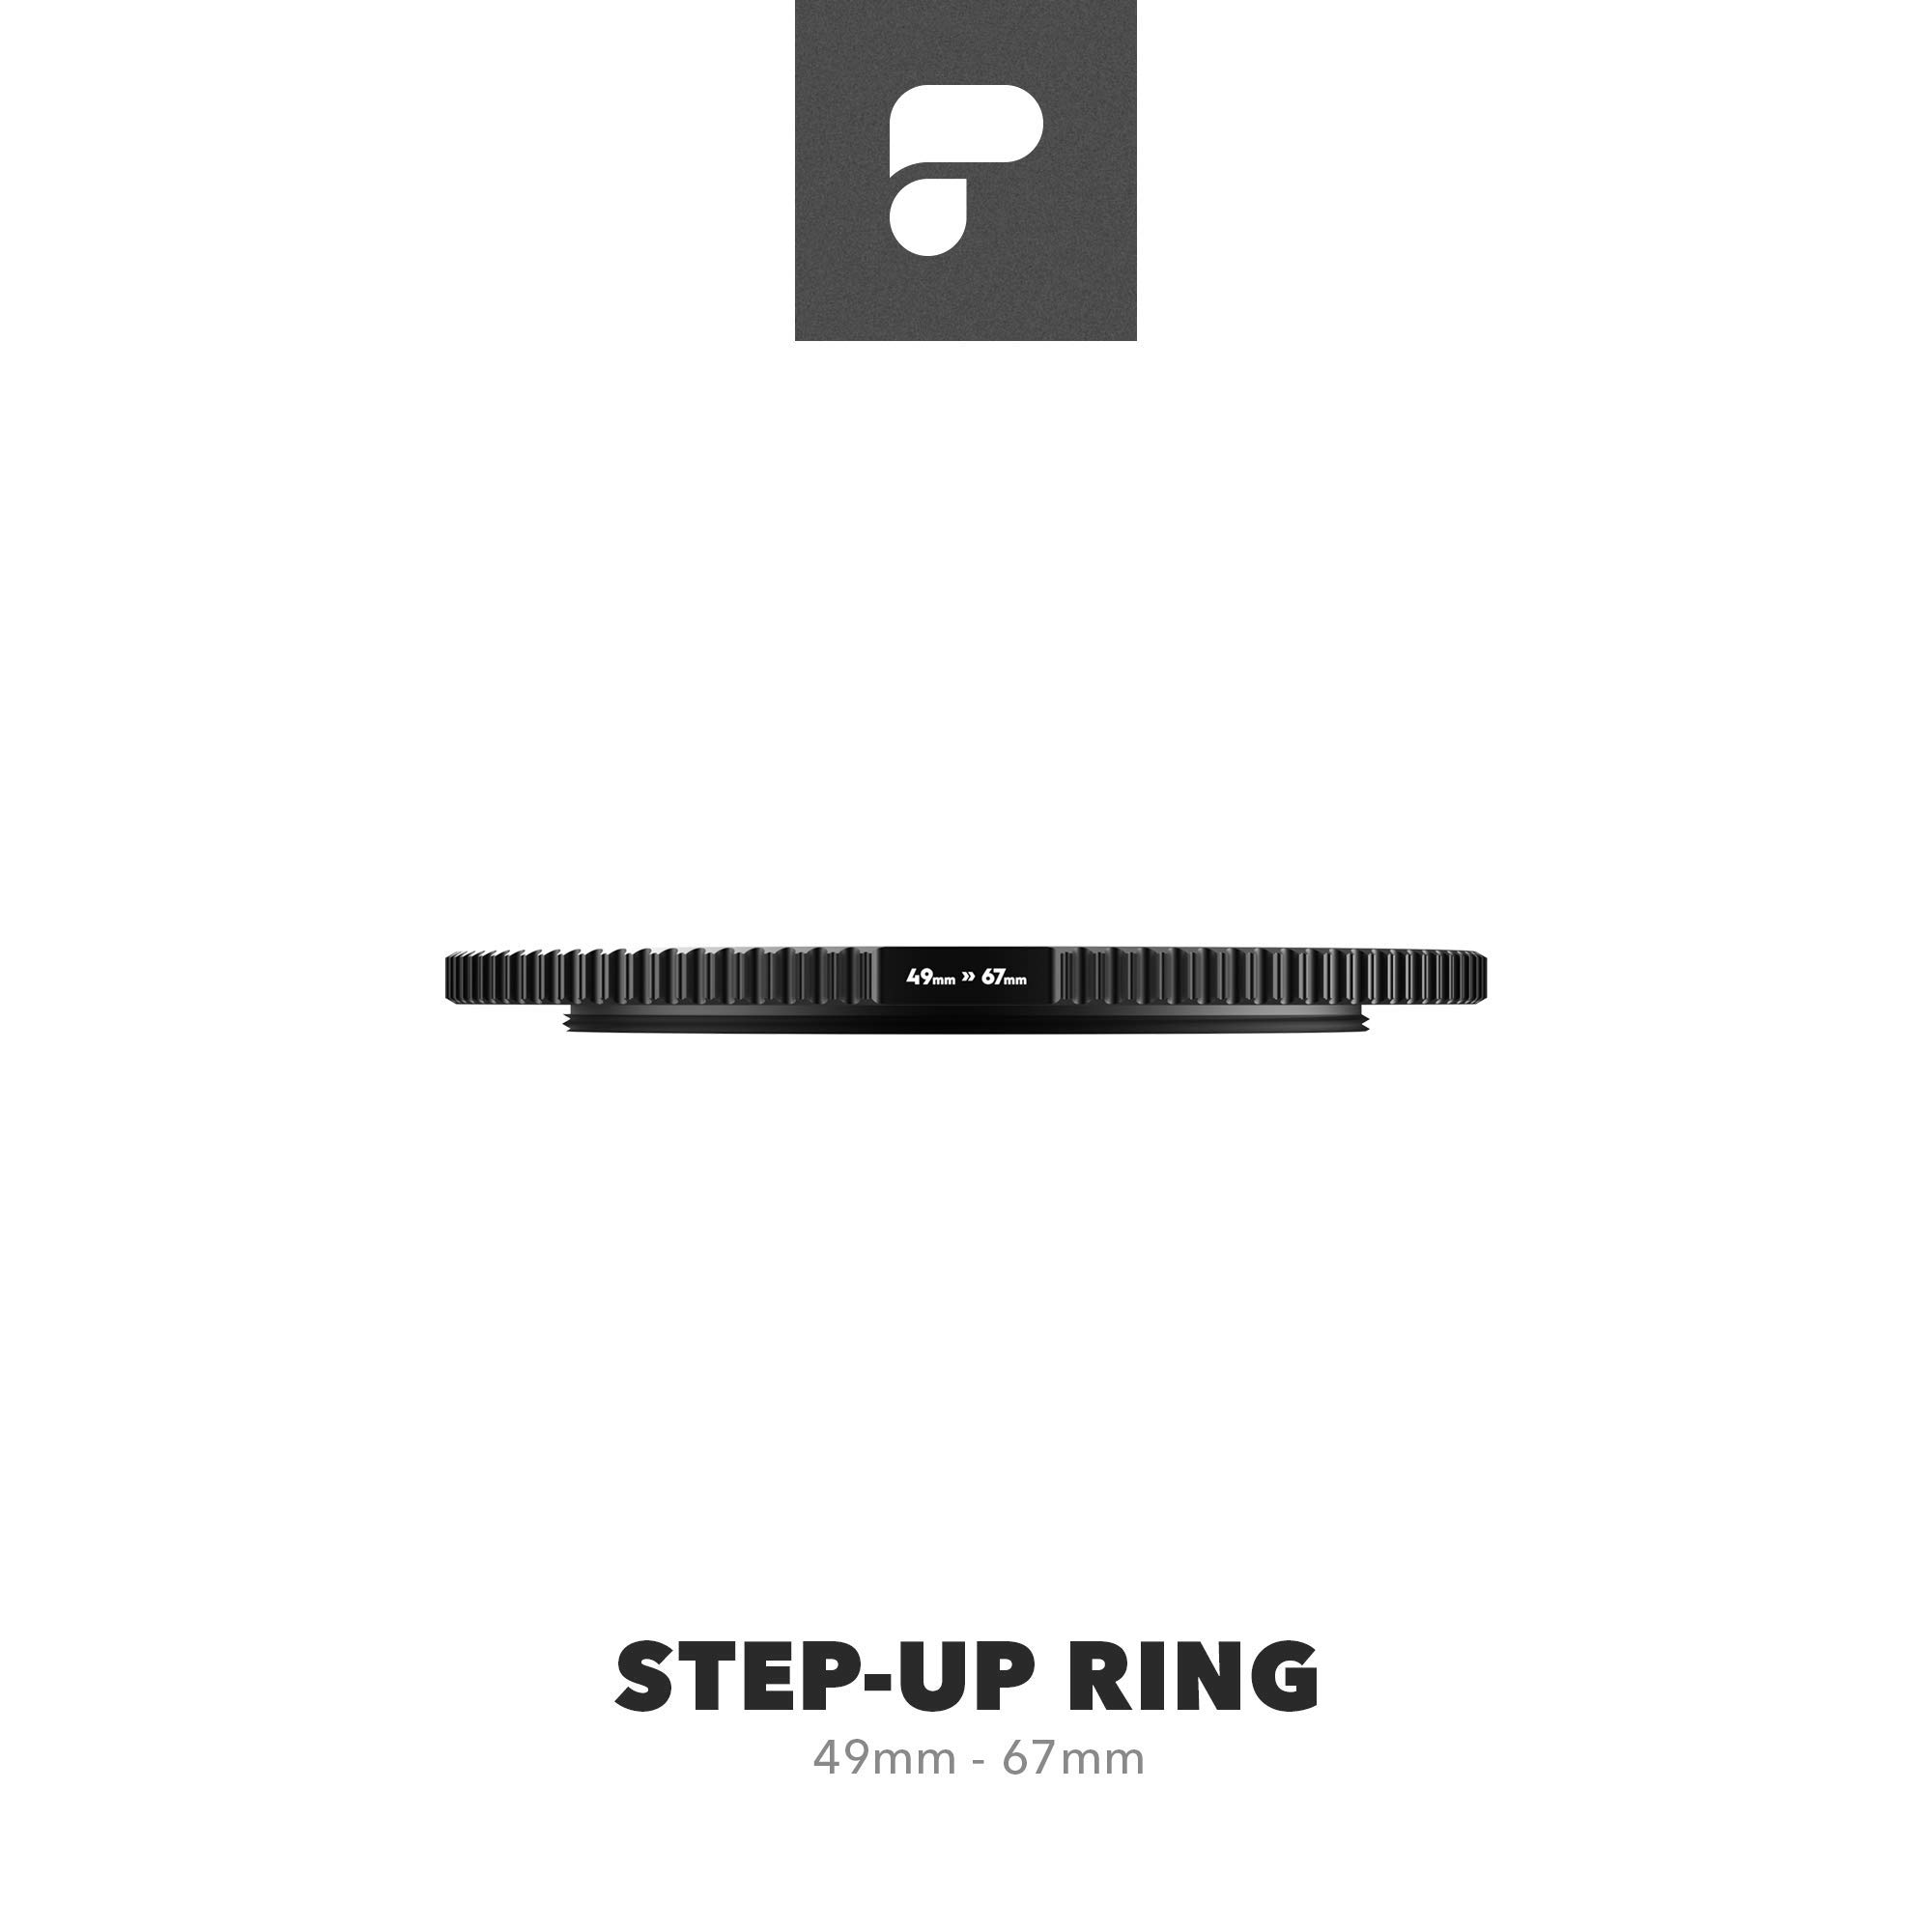 PolarPro Anti-Reflective Brass Step-Up Ring - 49mm > 67mm by PolarPro